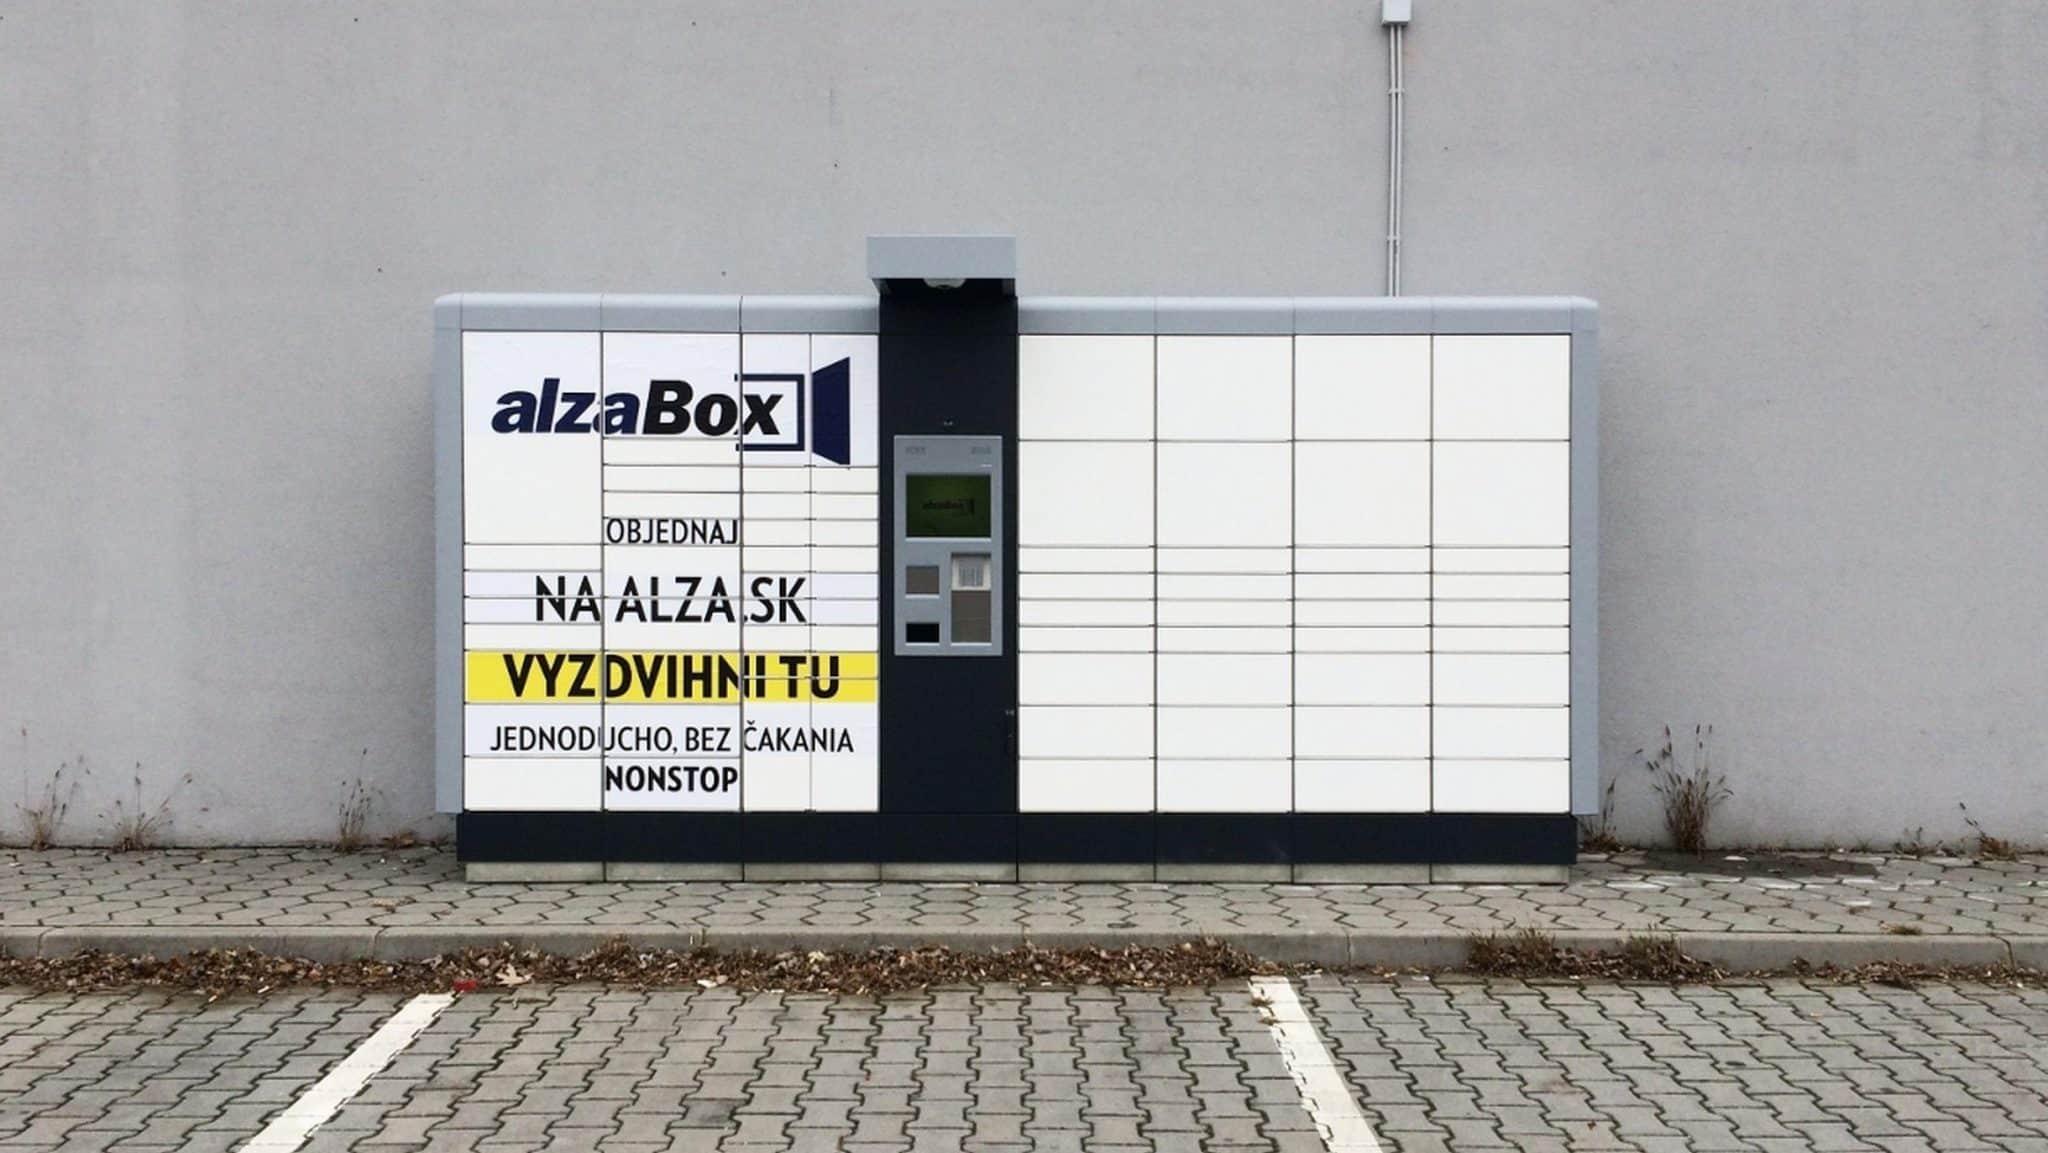 internetovy obchod alza